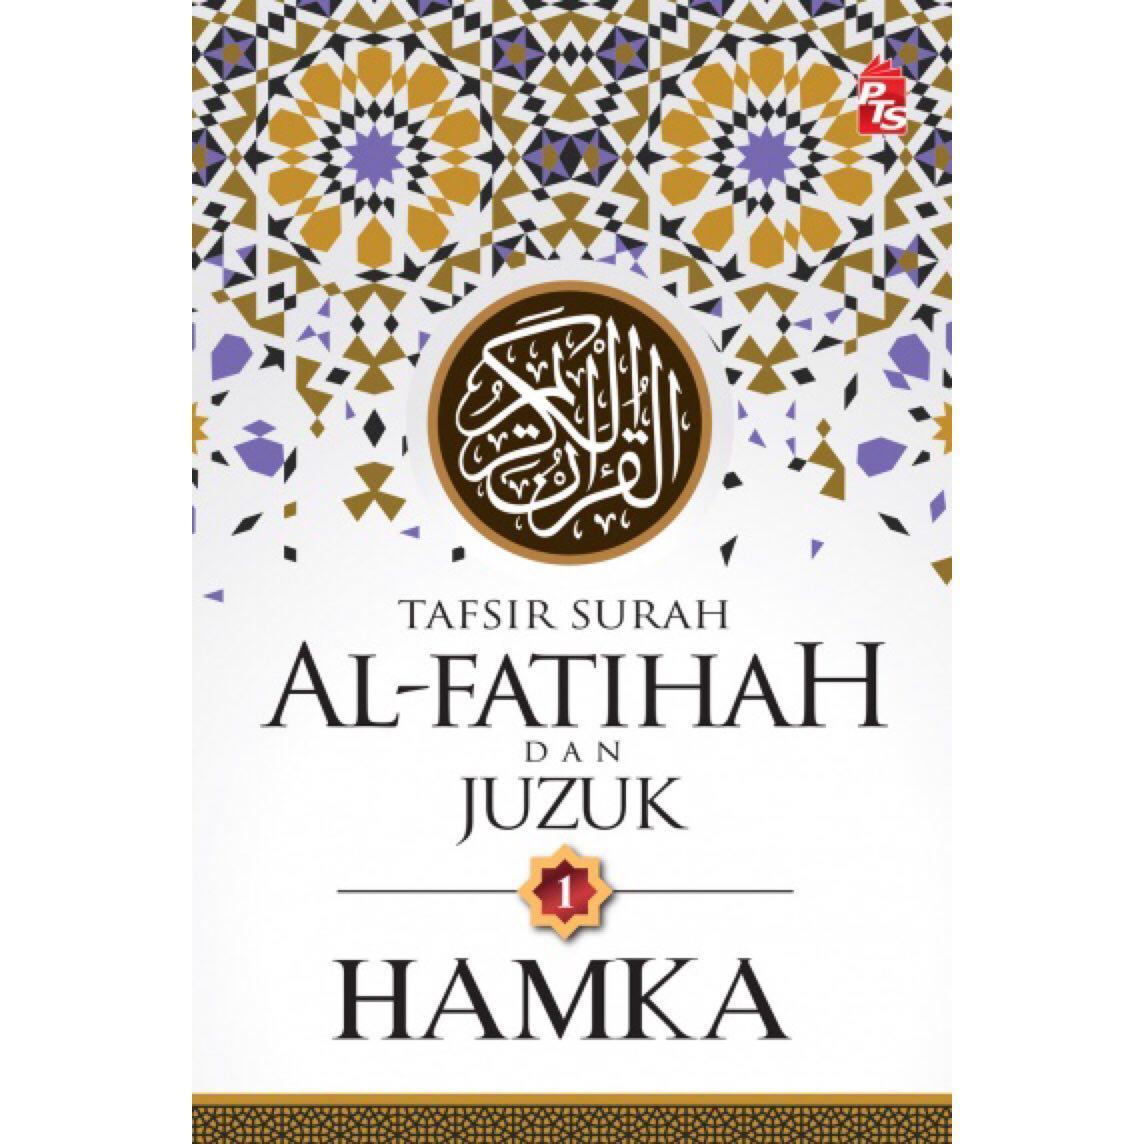 alquran Tafsir Surah Al-Fatihah dan Juzuk 1 -HAMKA